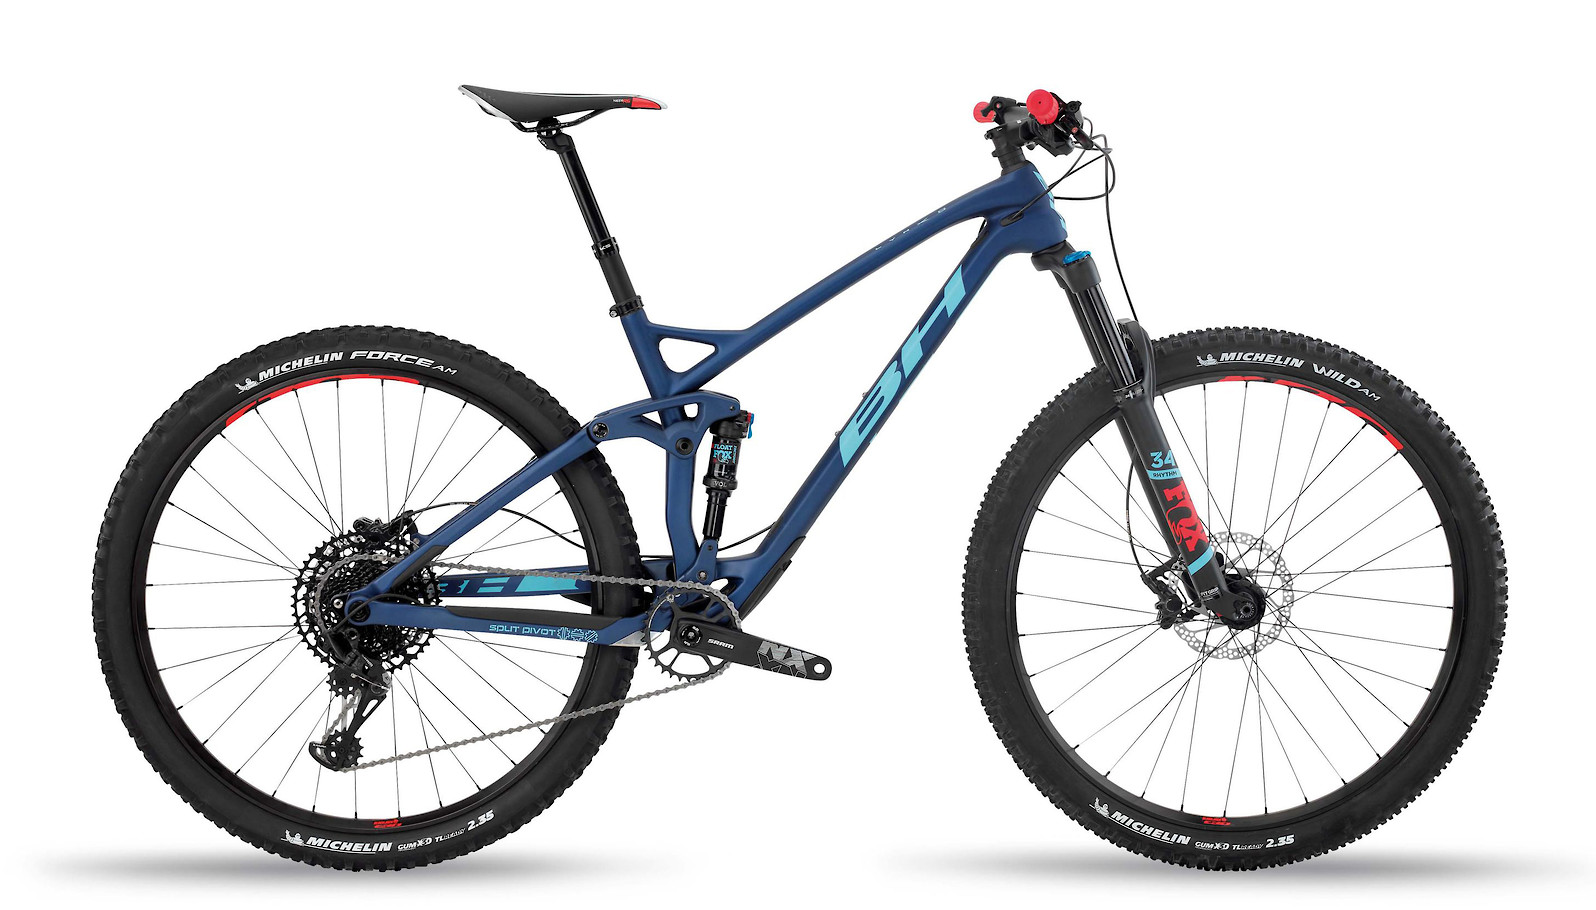 2020 BH Lynx 5 Carbon 6.9